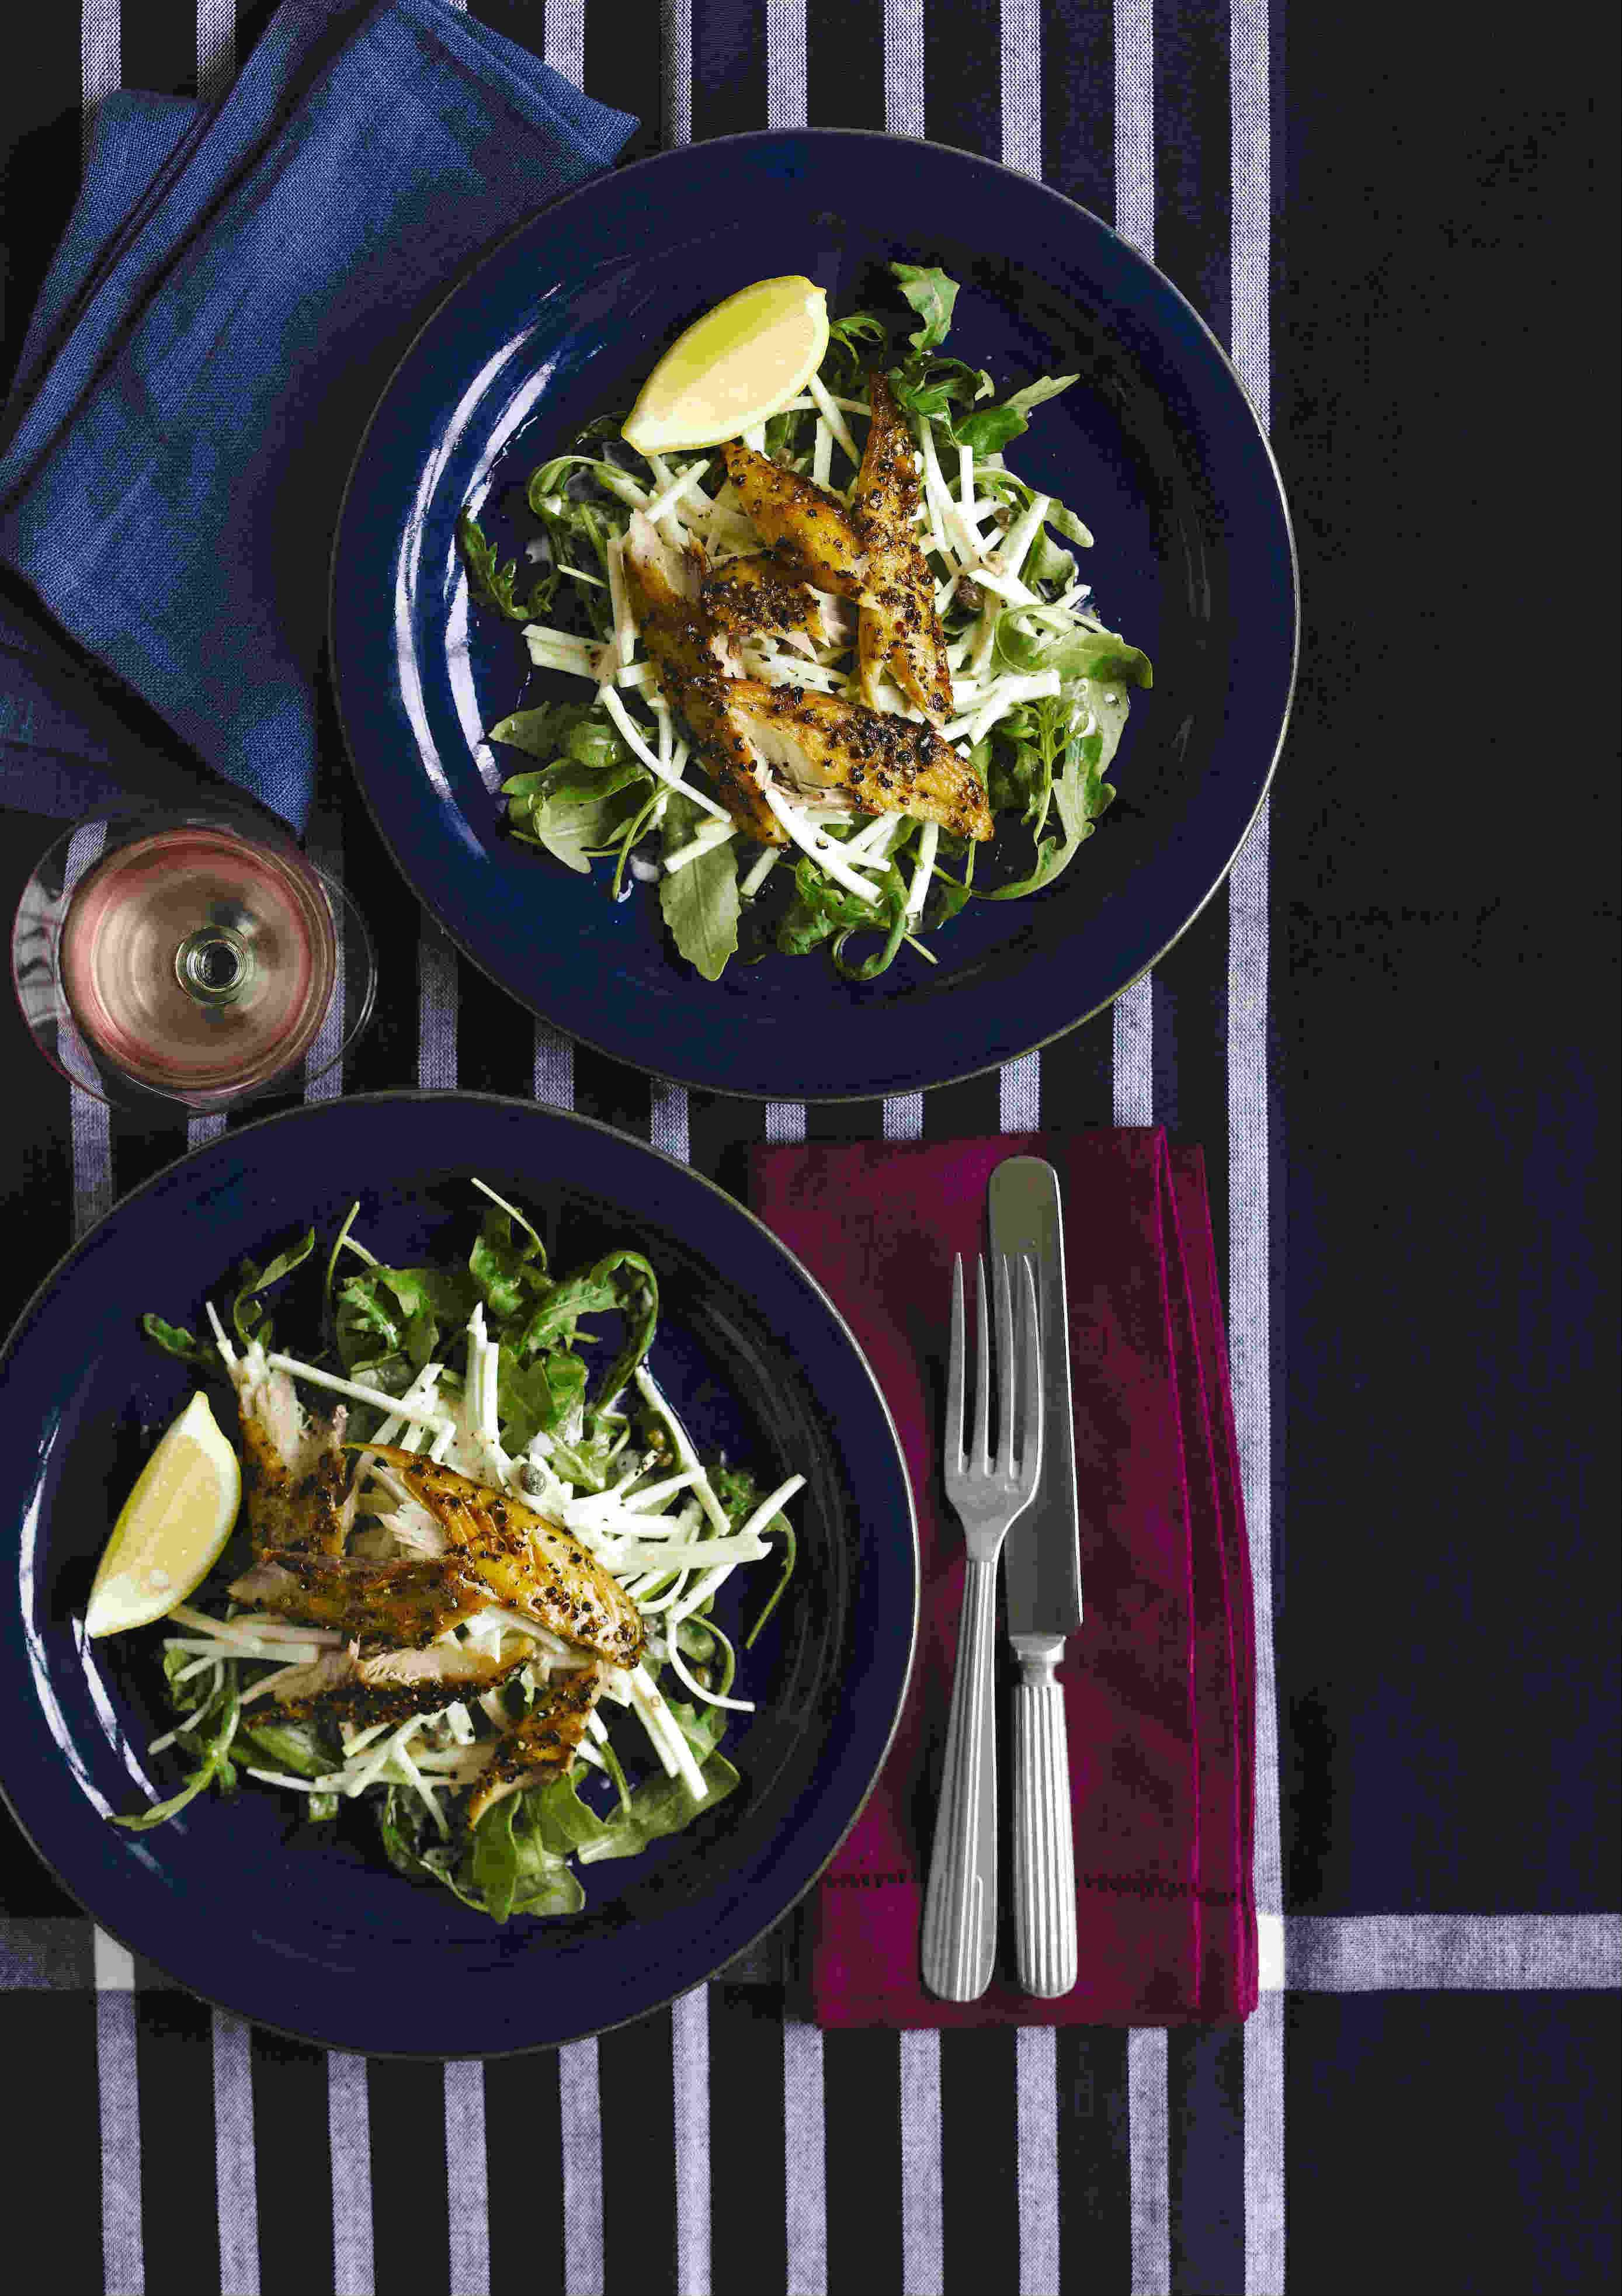 Smoked Mackerel Recipe with Celeriac and Rocket Salad